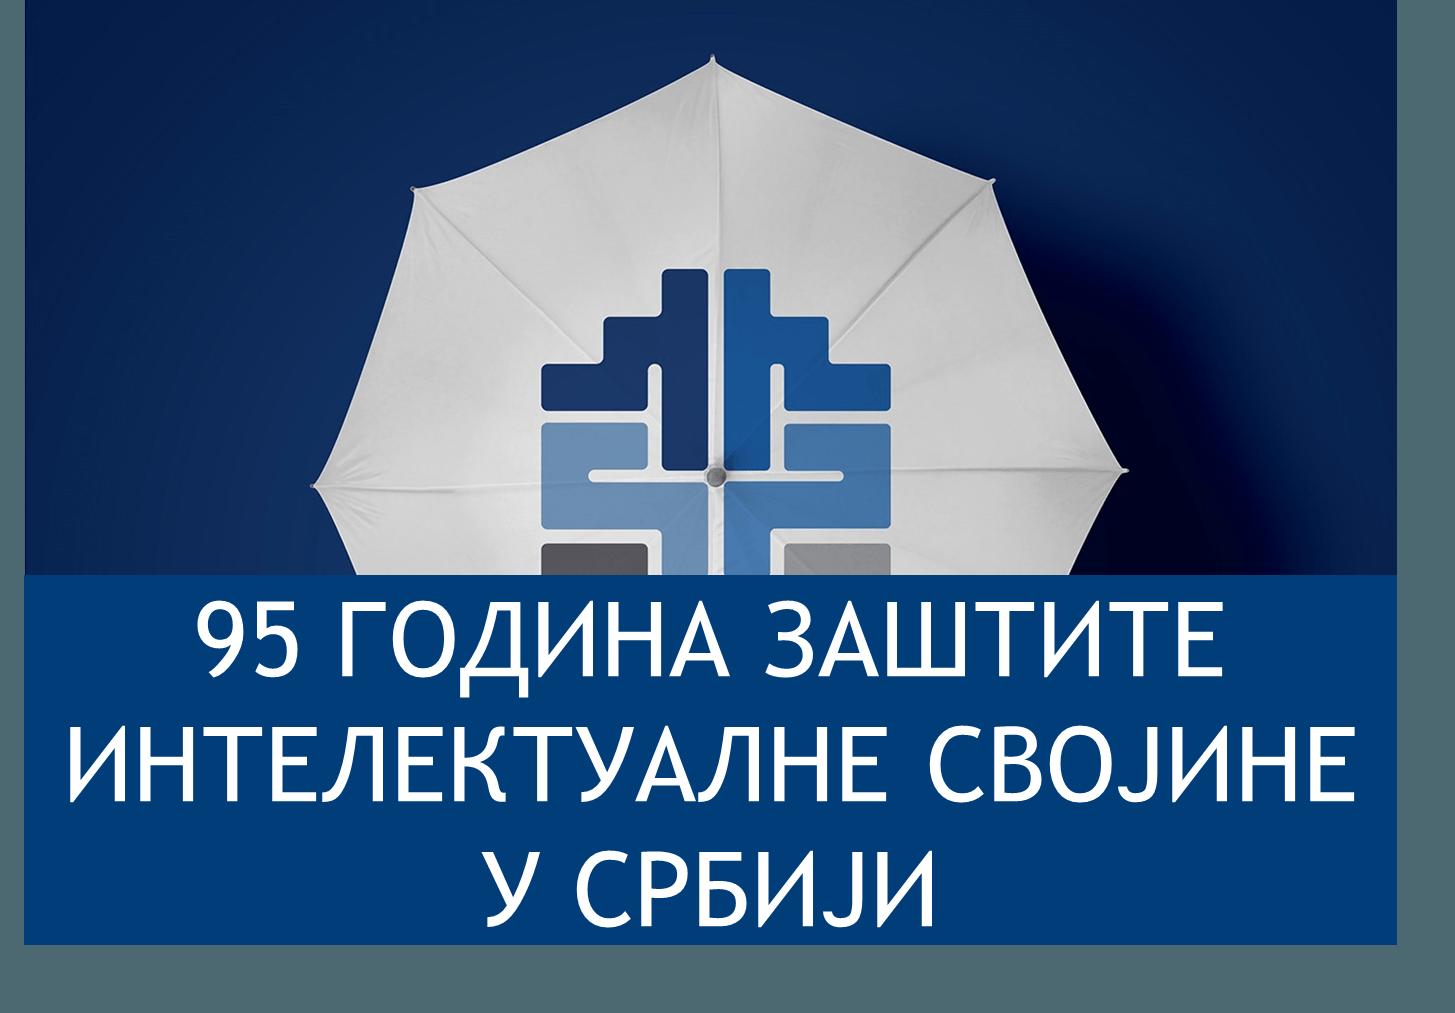 Izložba povodom 95 godina od osnivanja ZIV-a